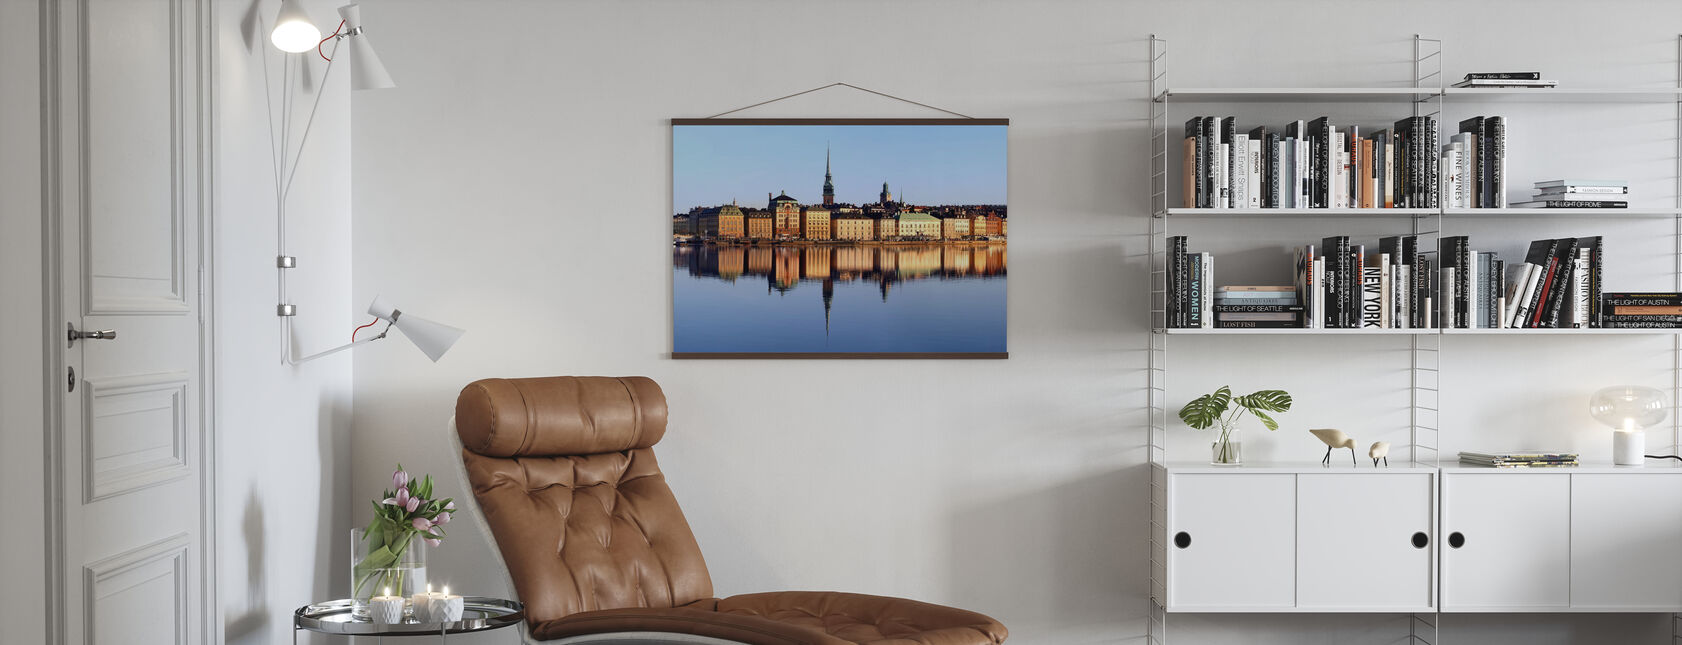 Stockholm Skeppsbron - Poster - Wohnzimmer